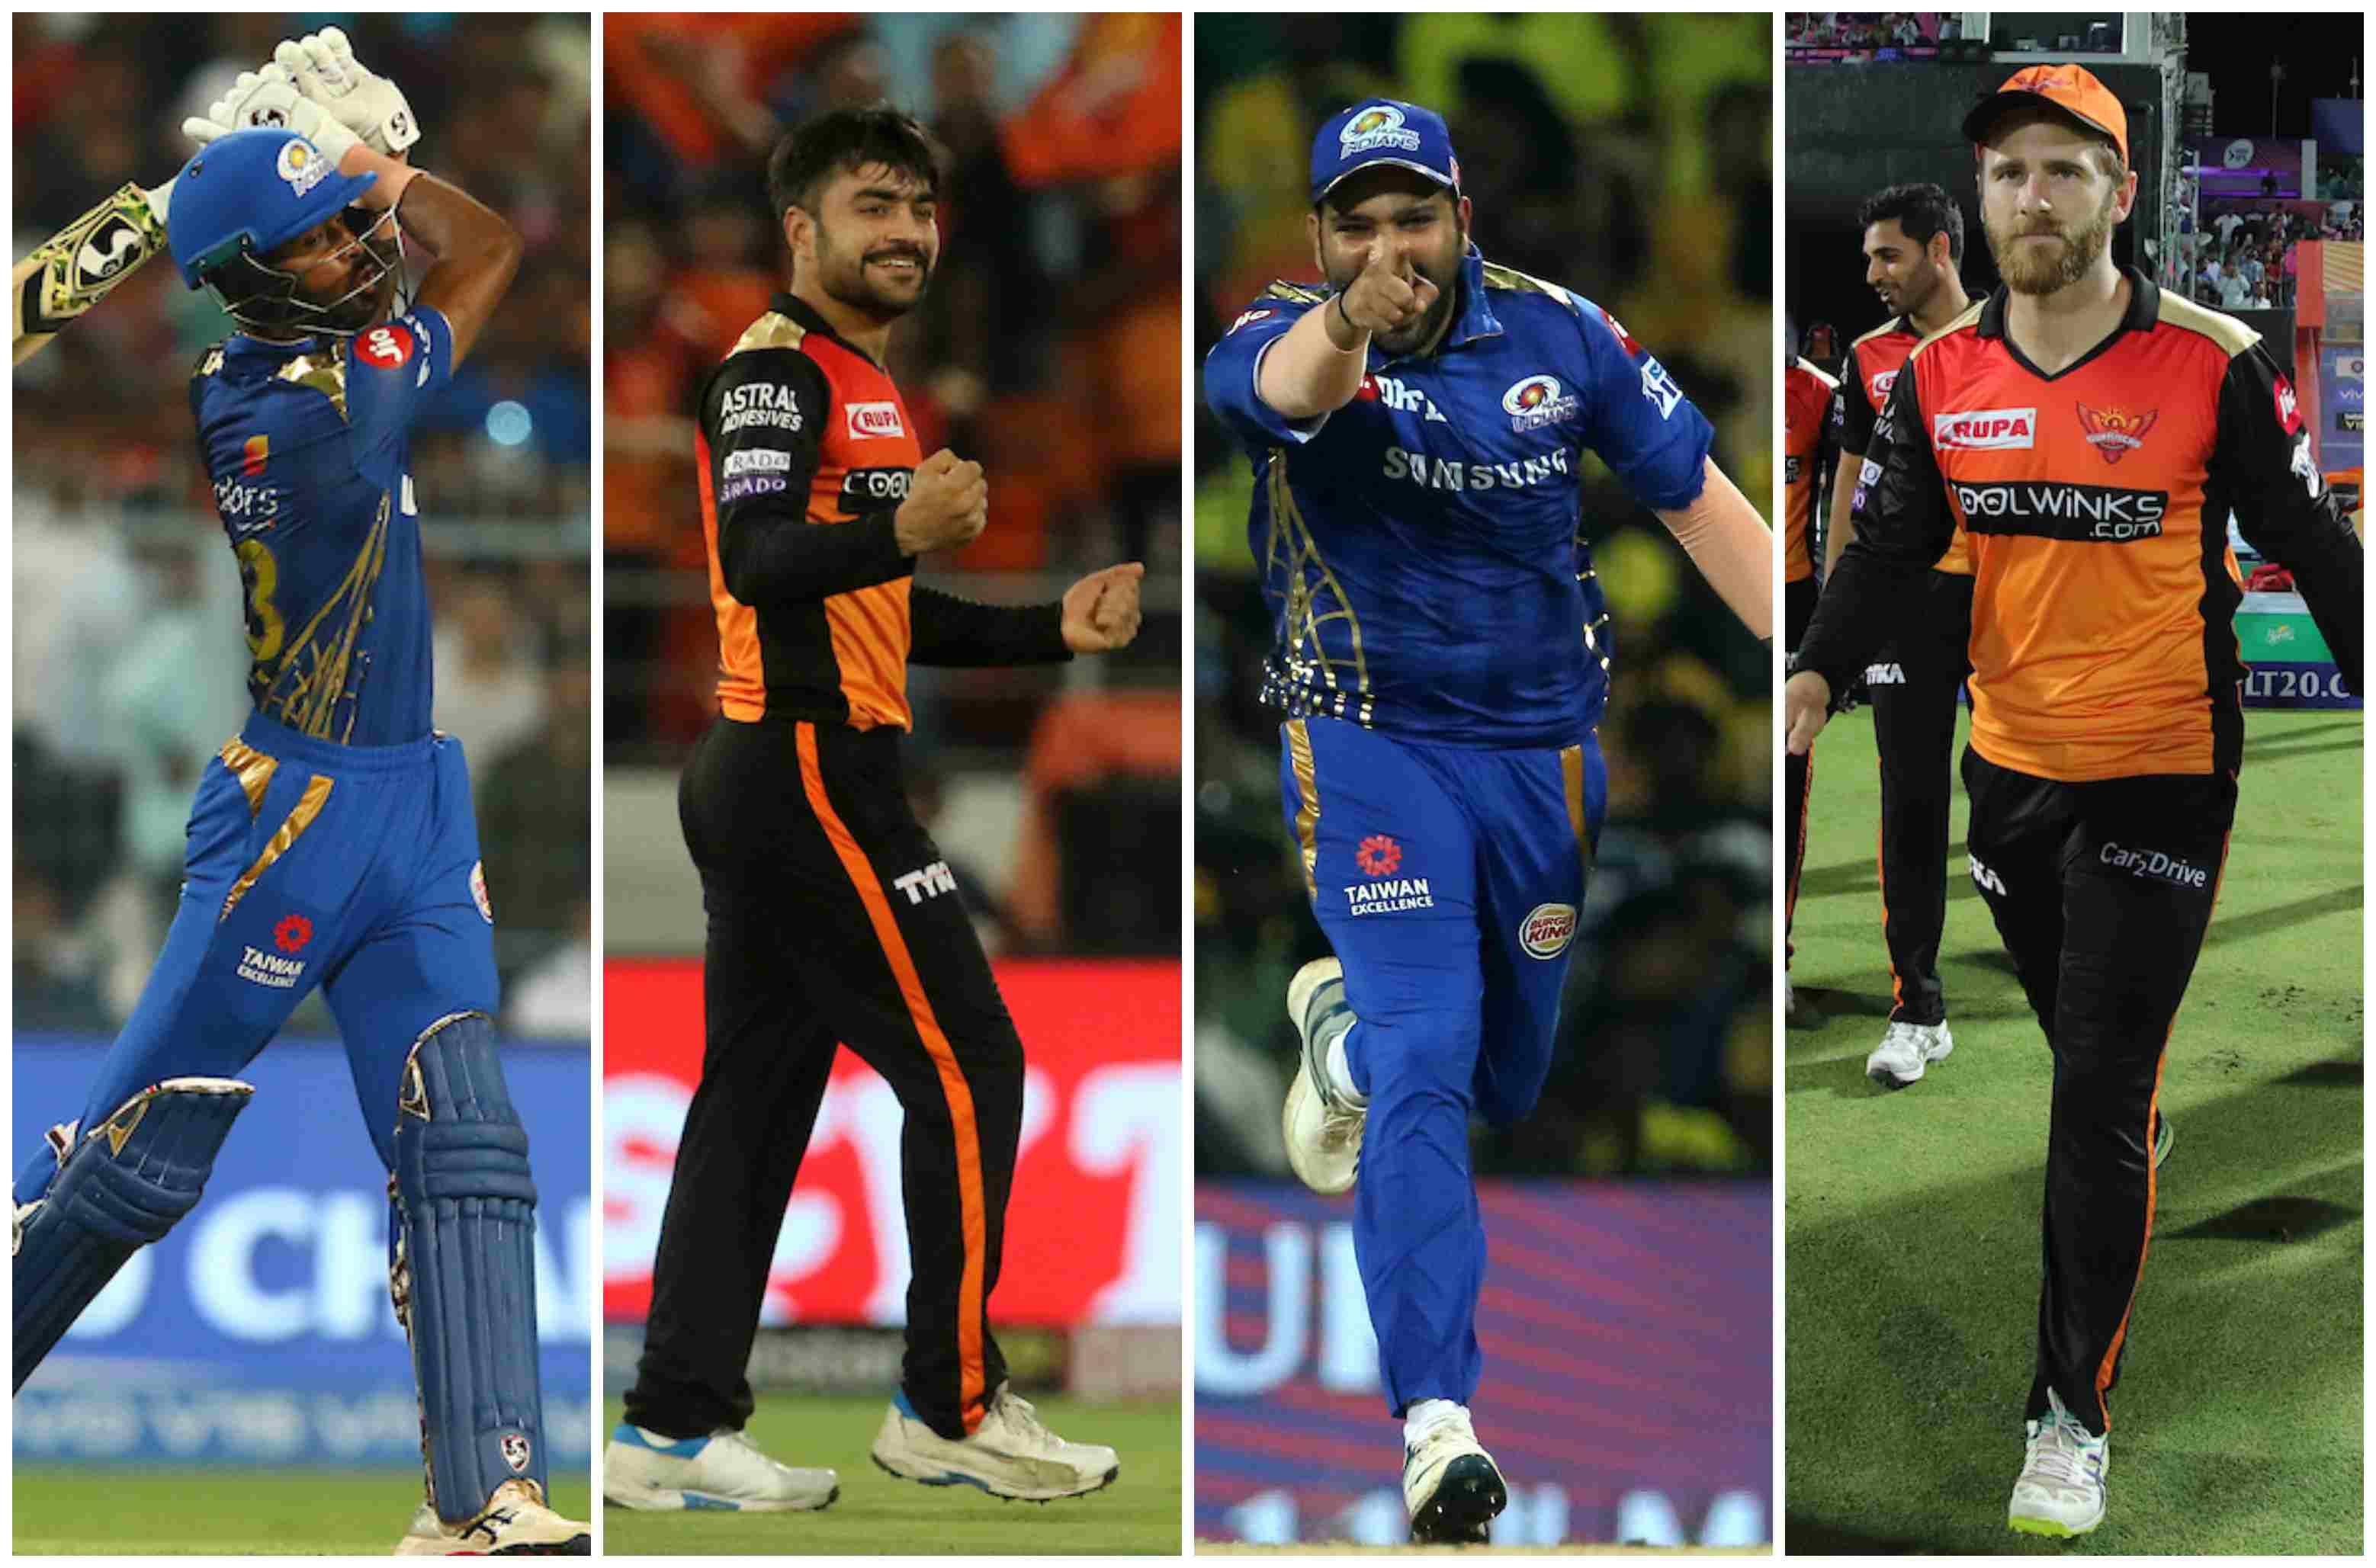 IPL 2019 MI vs SRH Match 51: All to play for as playoffs spot beckons